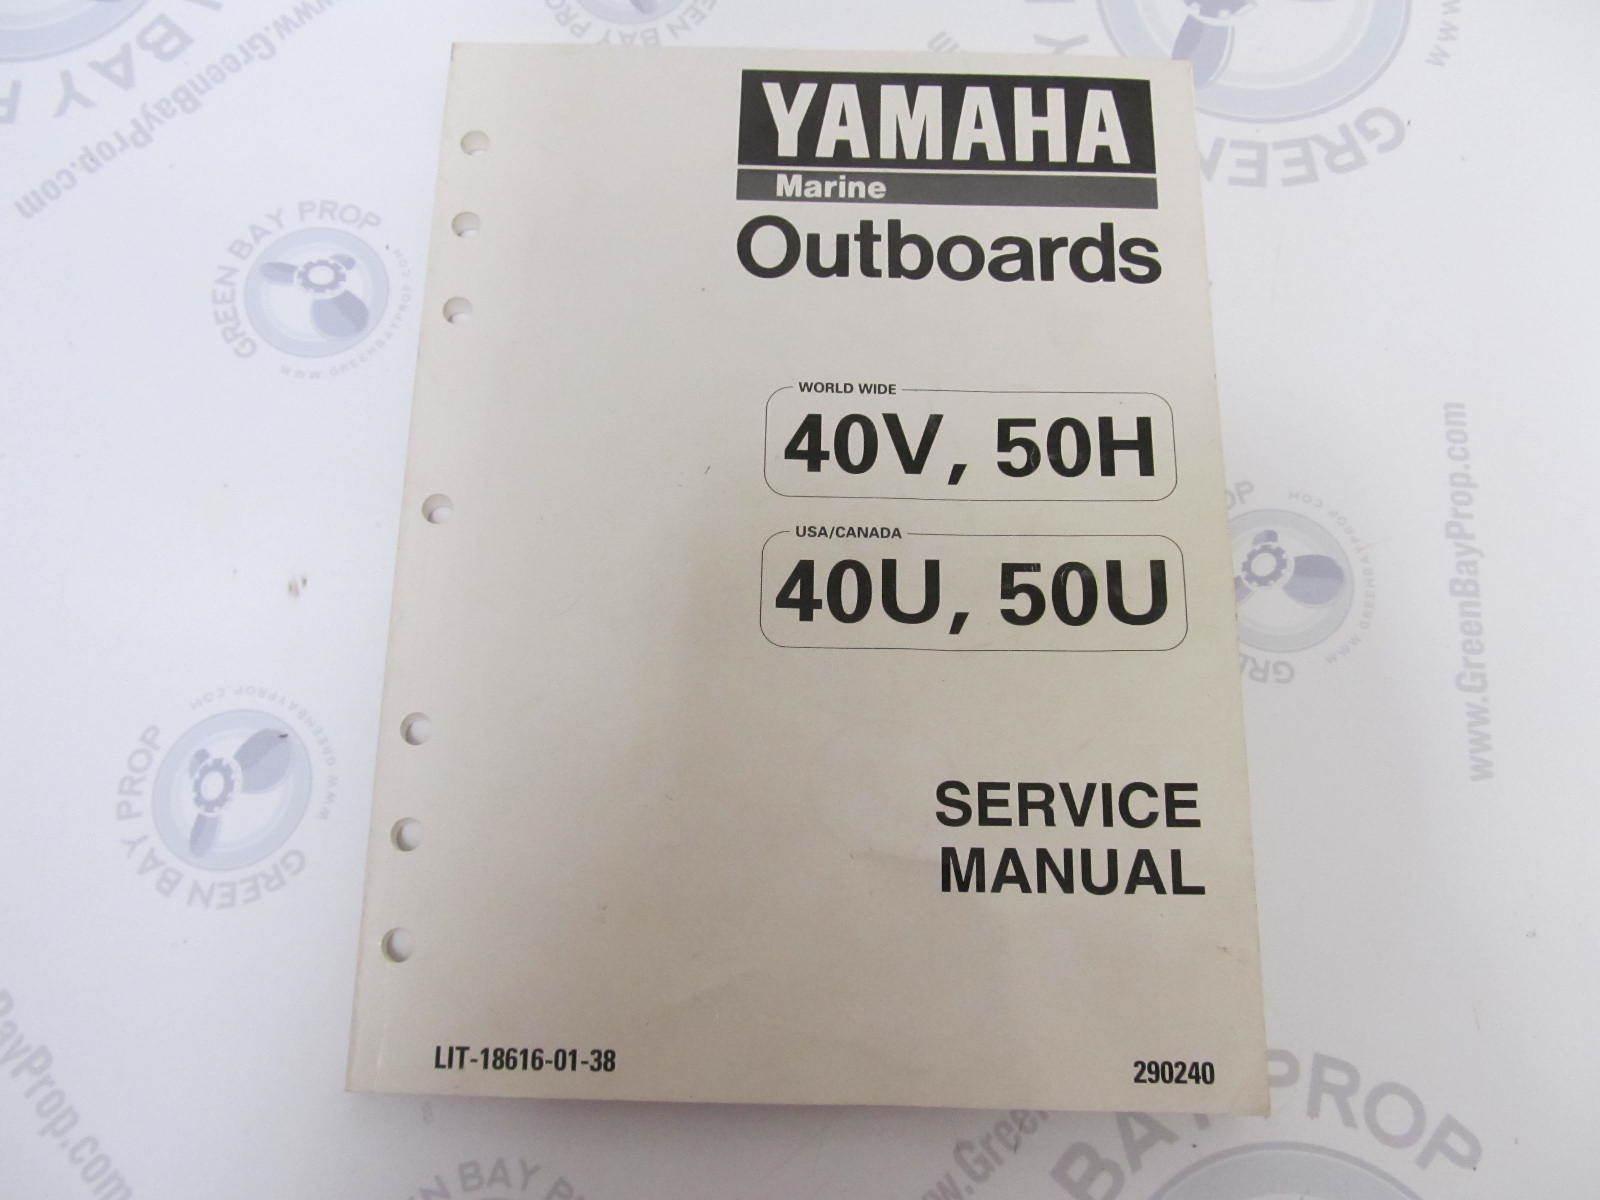 LIT-18616-01-38 Yamaha Outboard Service Manual 40-50 HP ...